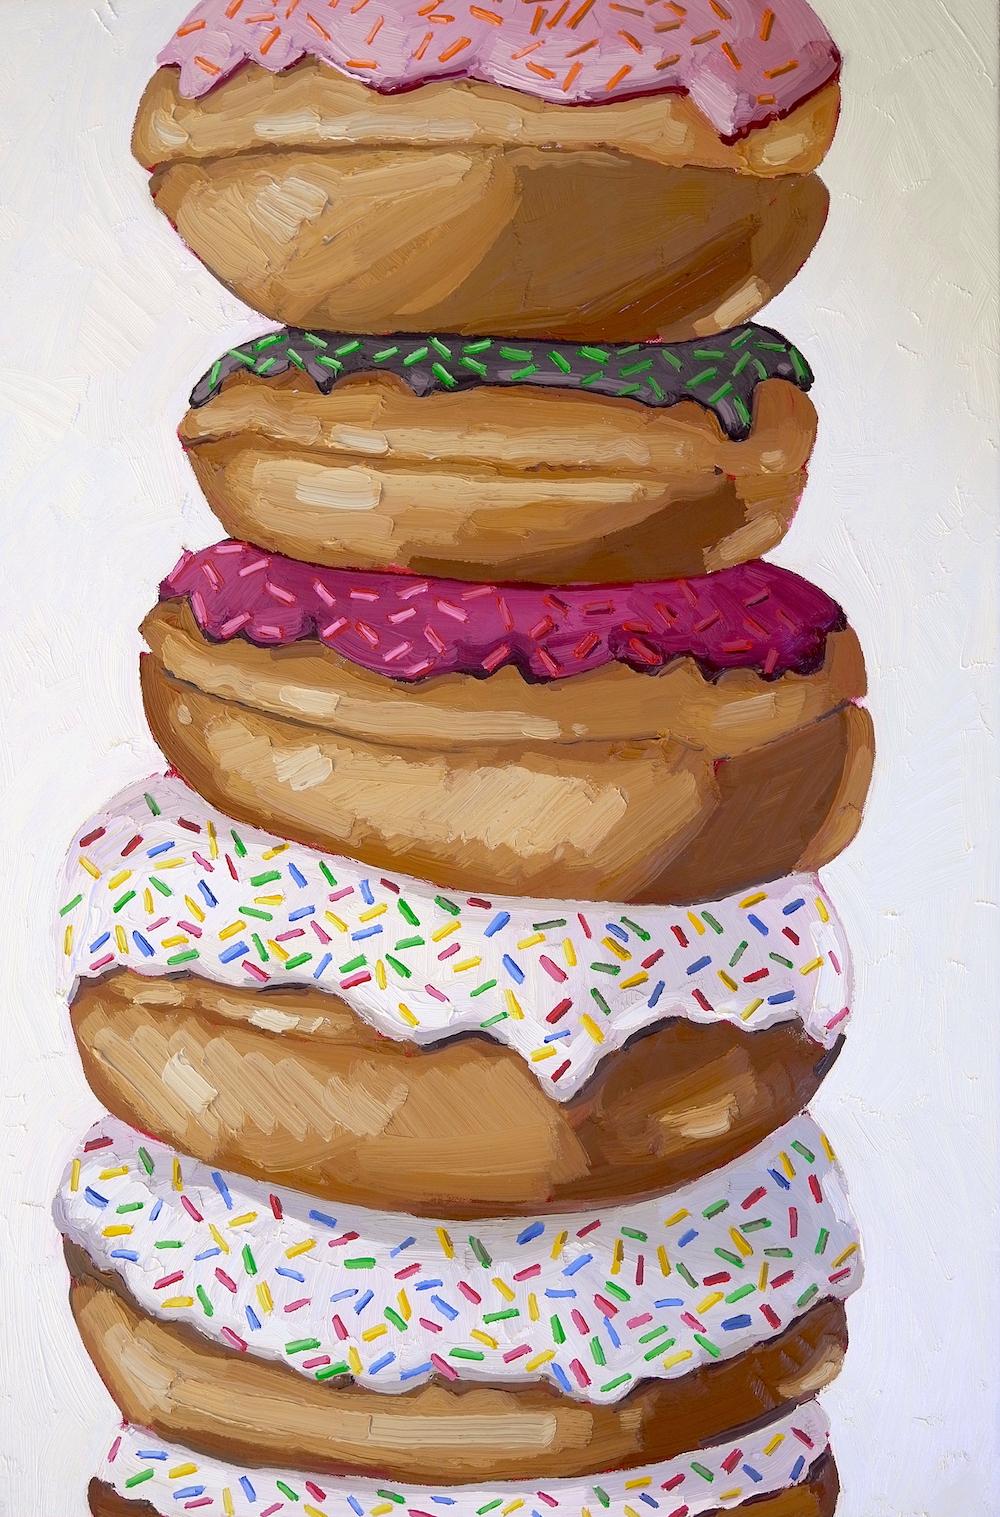 Donut Pile copy.JPG